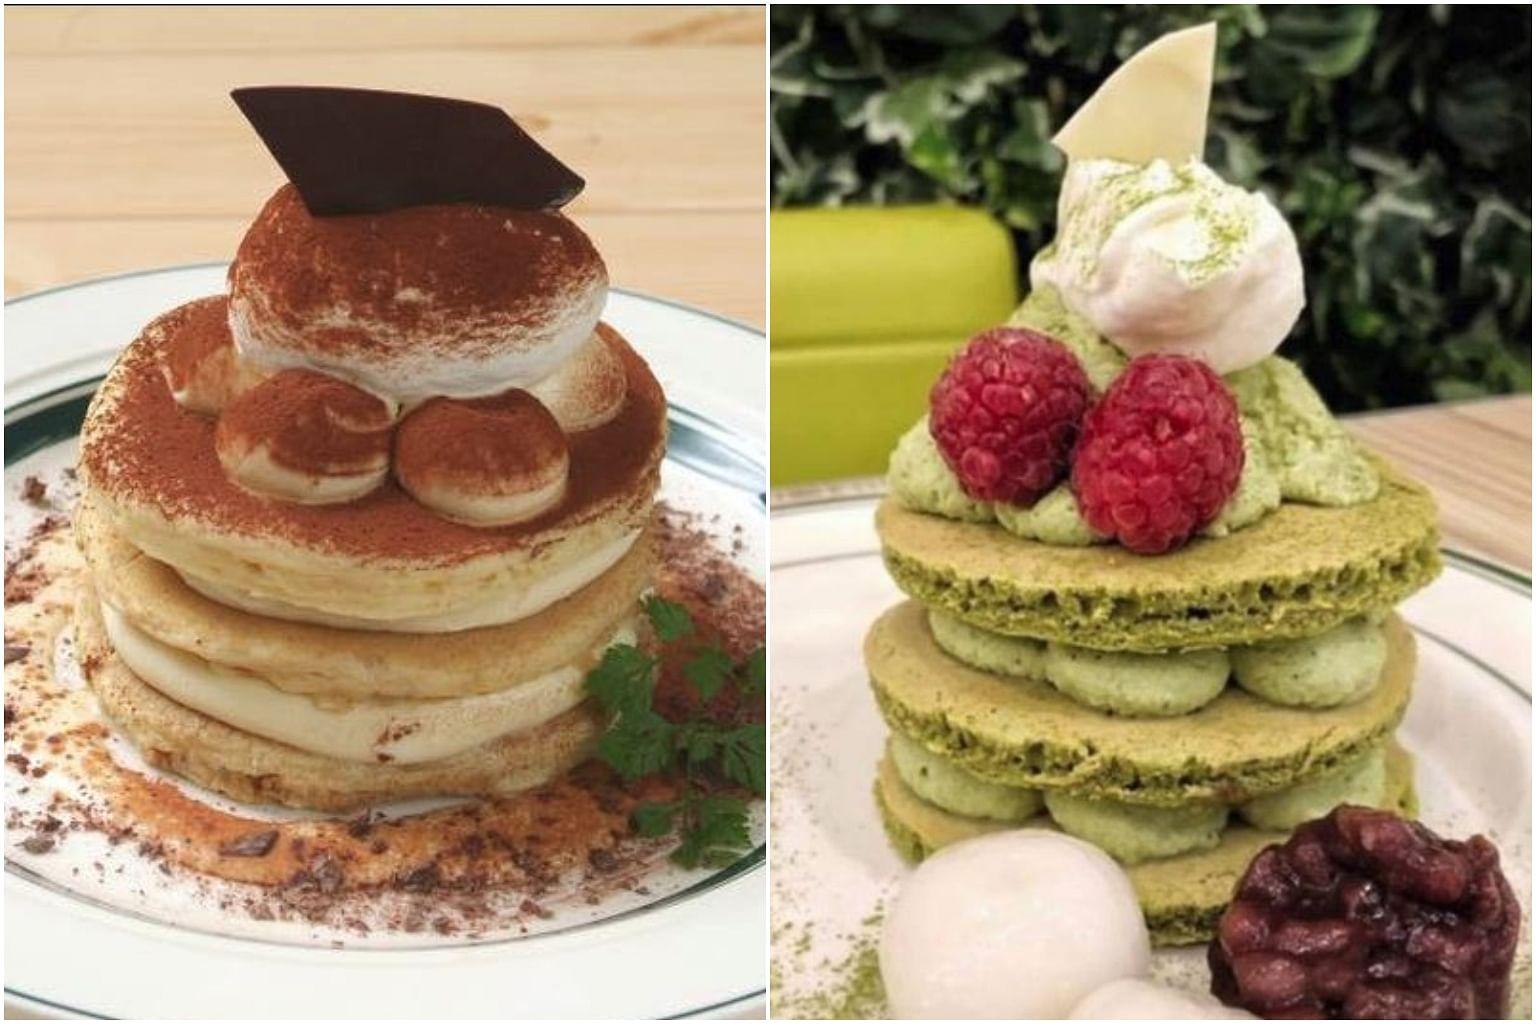 Osaka's Gram Cafe famous for wobbly pancakes opening at